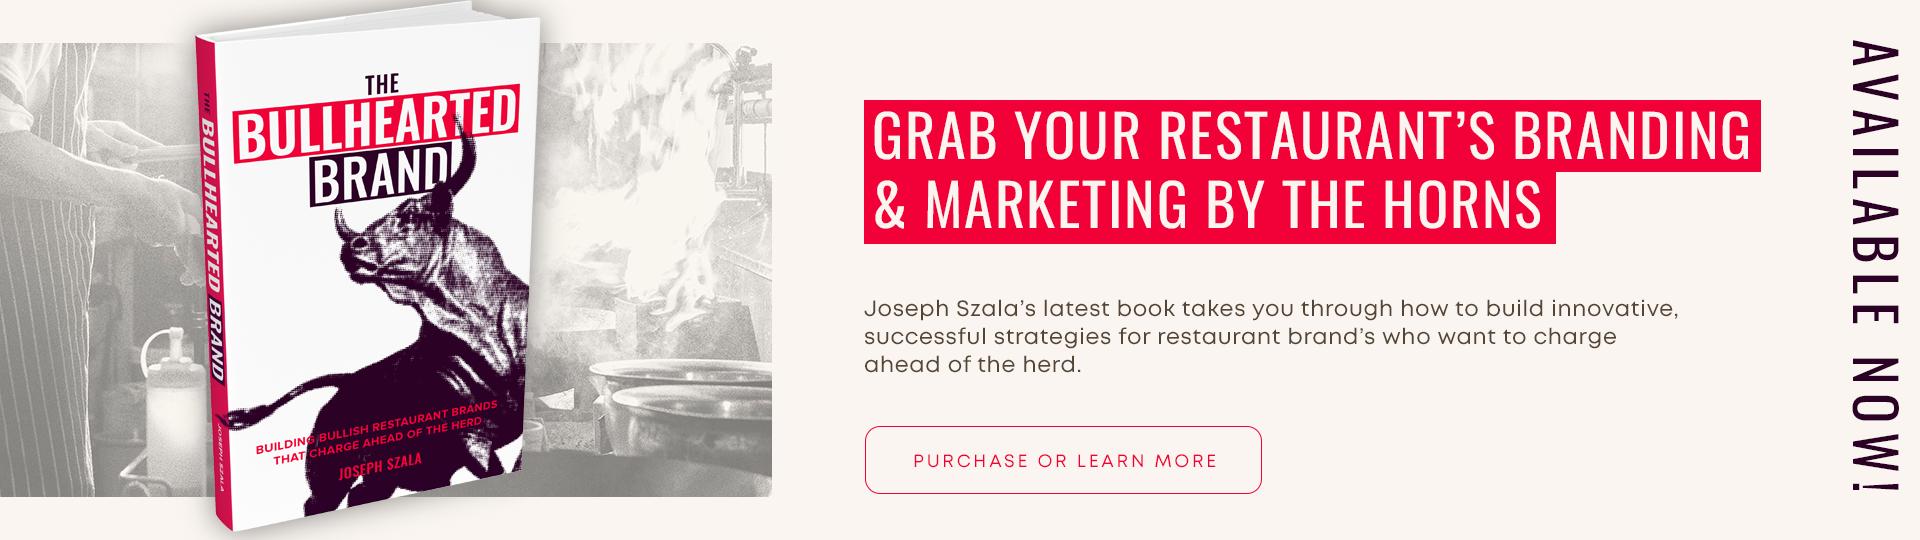 The Bullhearted Brand - restaurant branding and marketing book